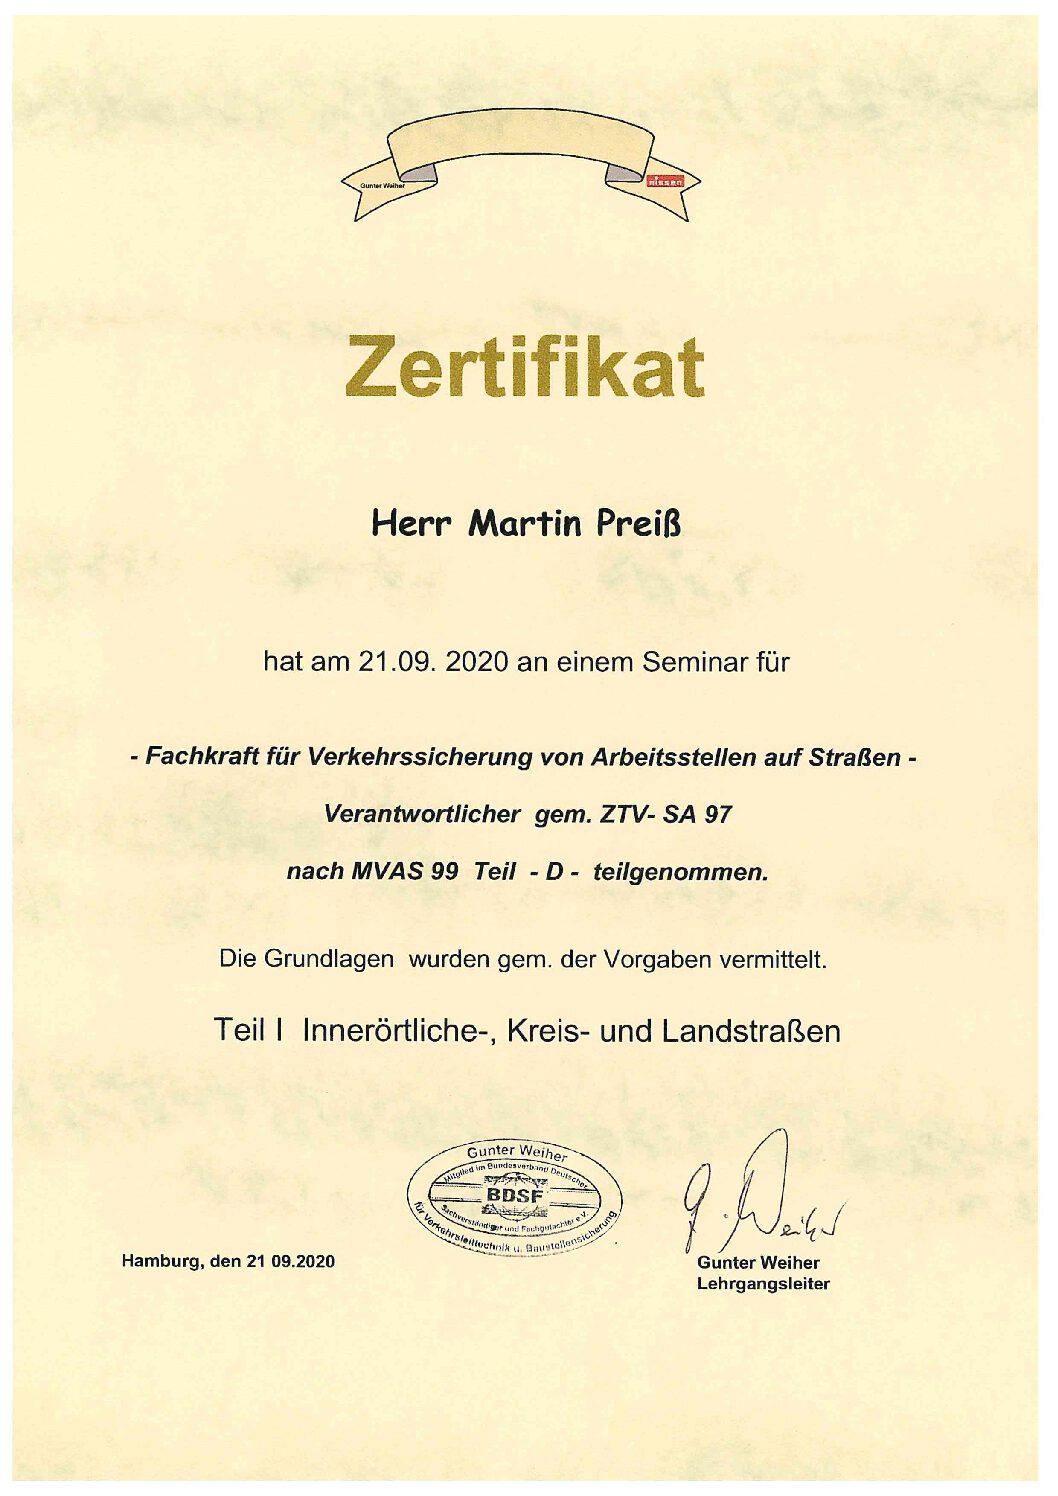 schadstoffsanierung - Zertifikat Verkehrssicherung M Preiss pdf